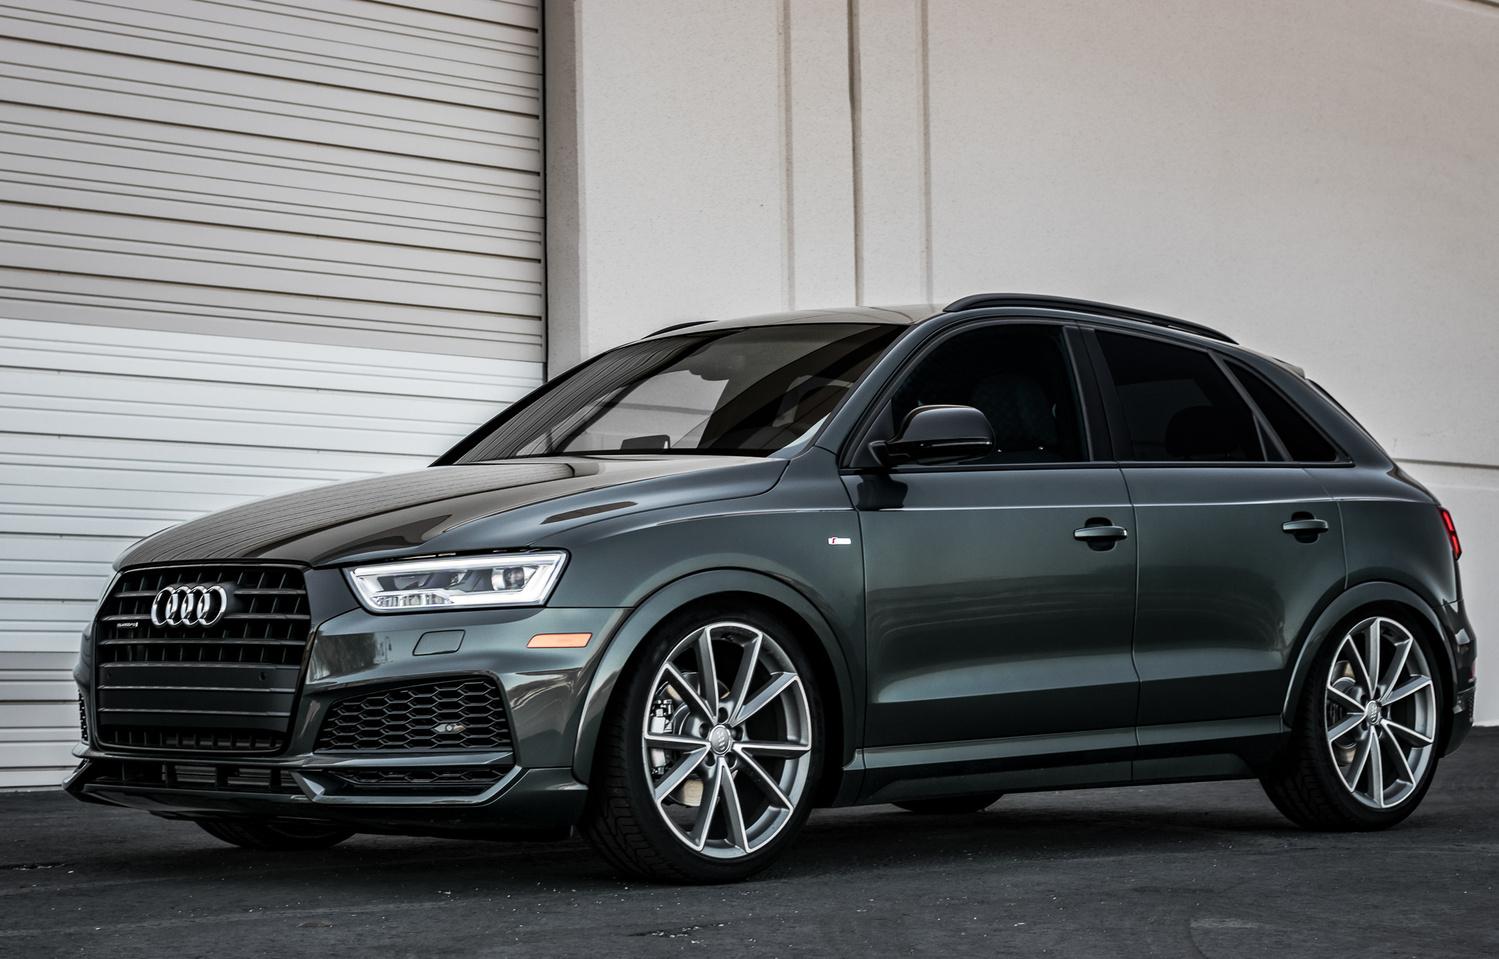 Audi Q3 by Travis Pinney